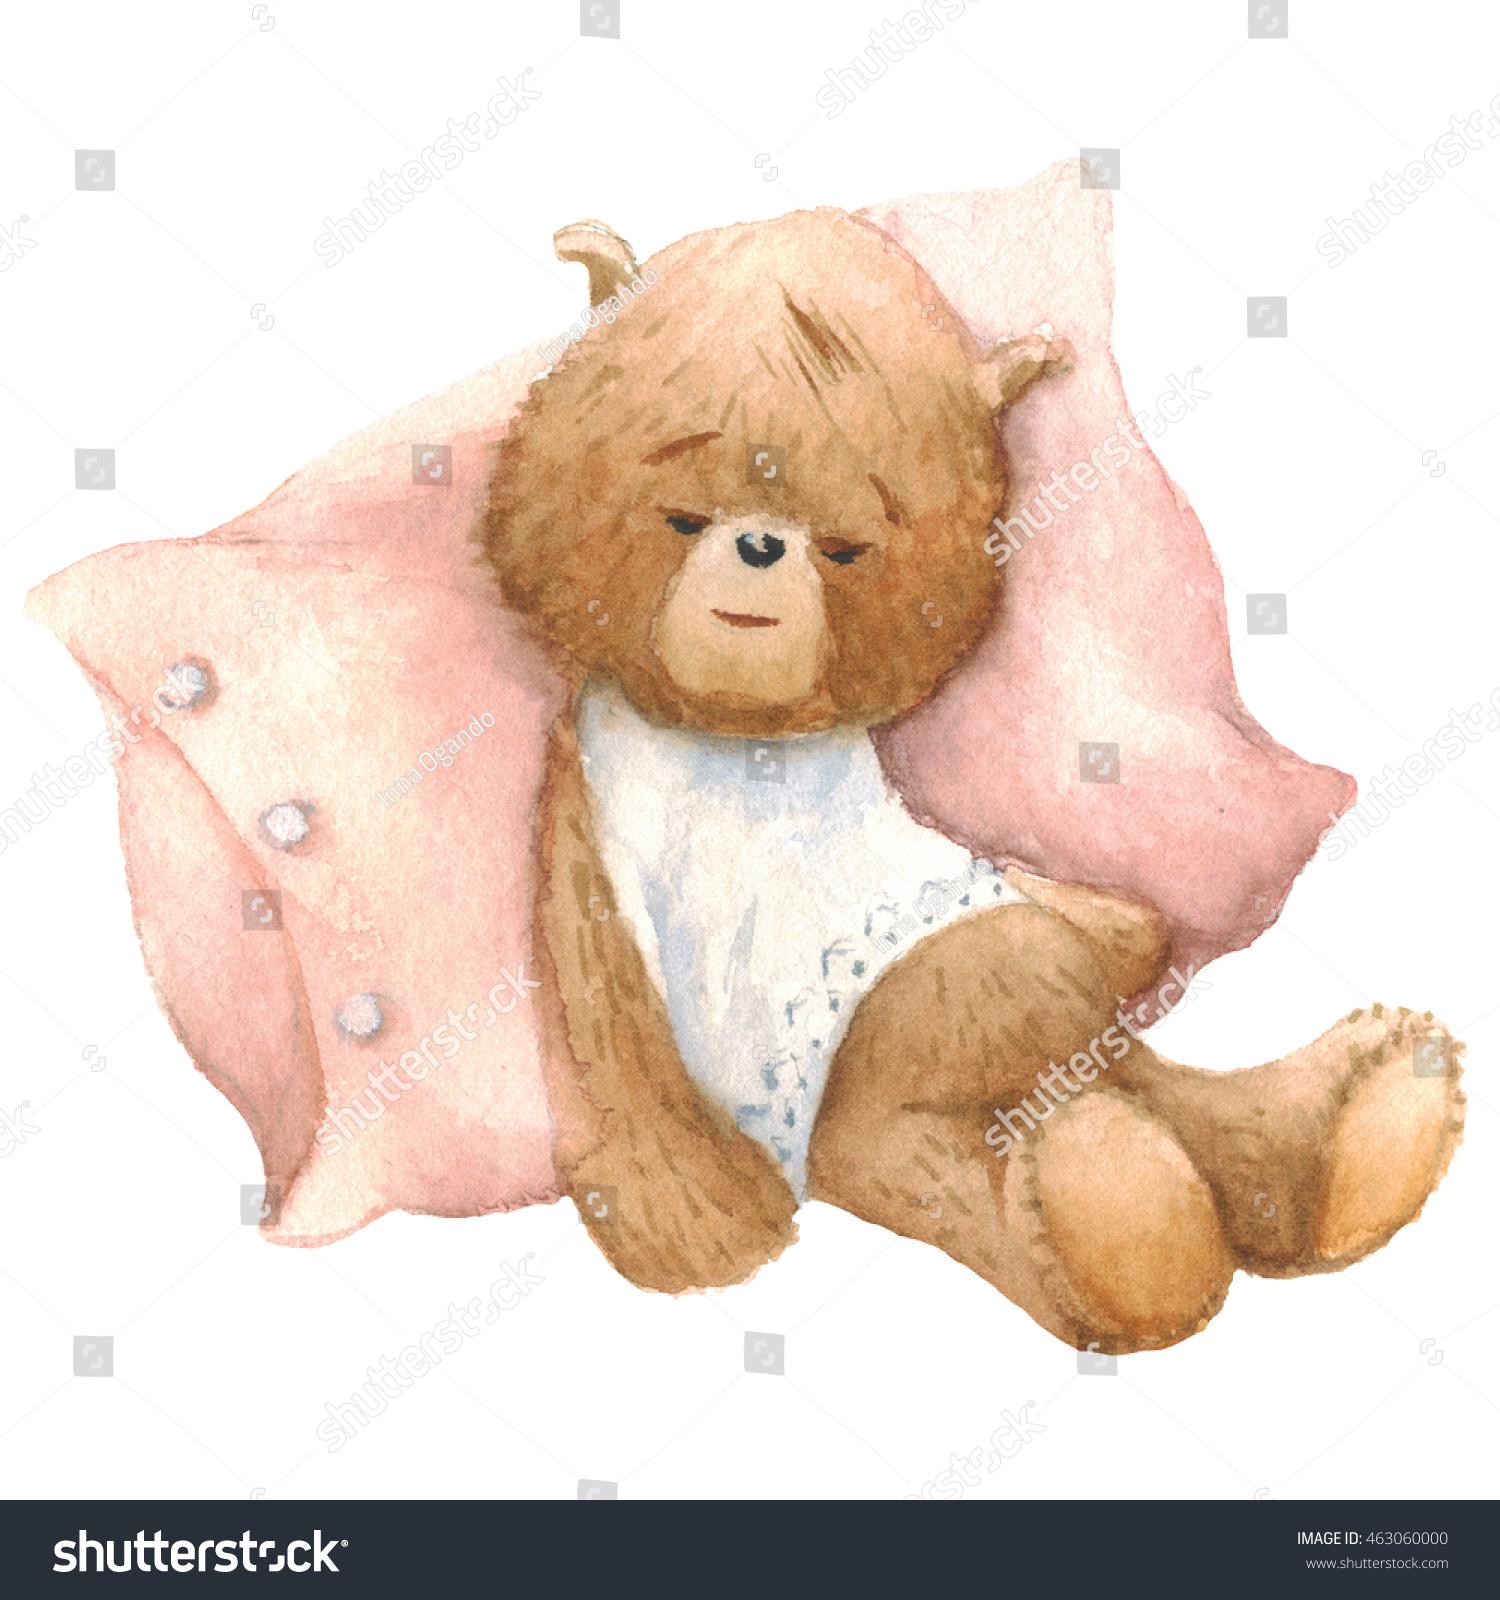 cute teddy bear sleeping pillow watercolor stock illustration